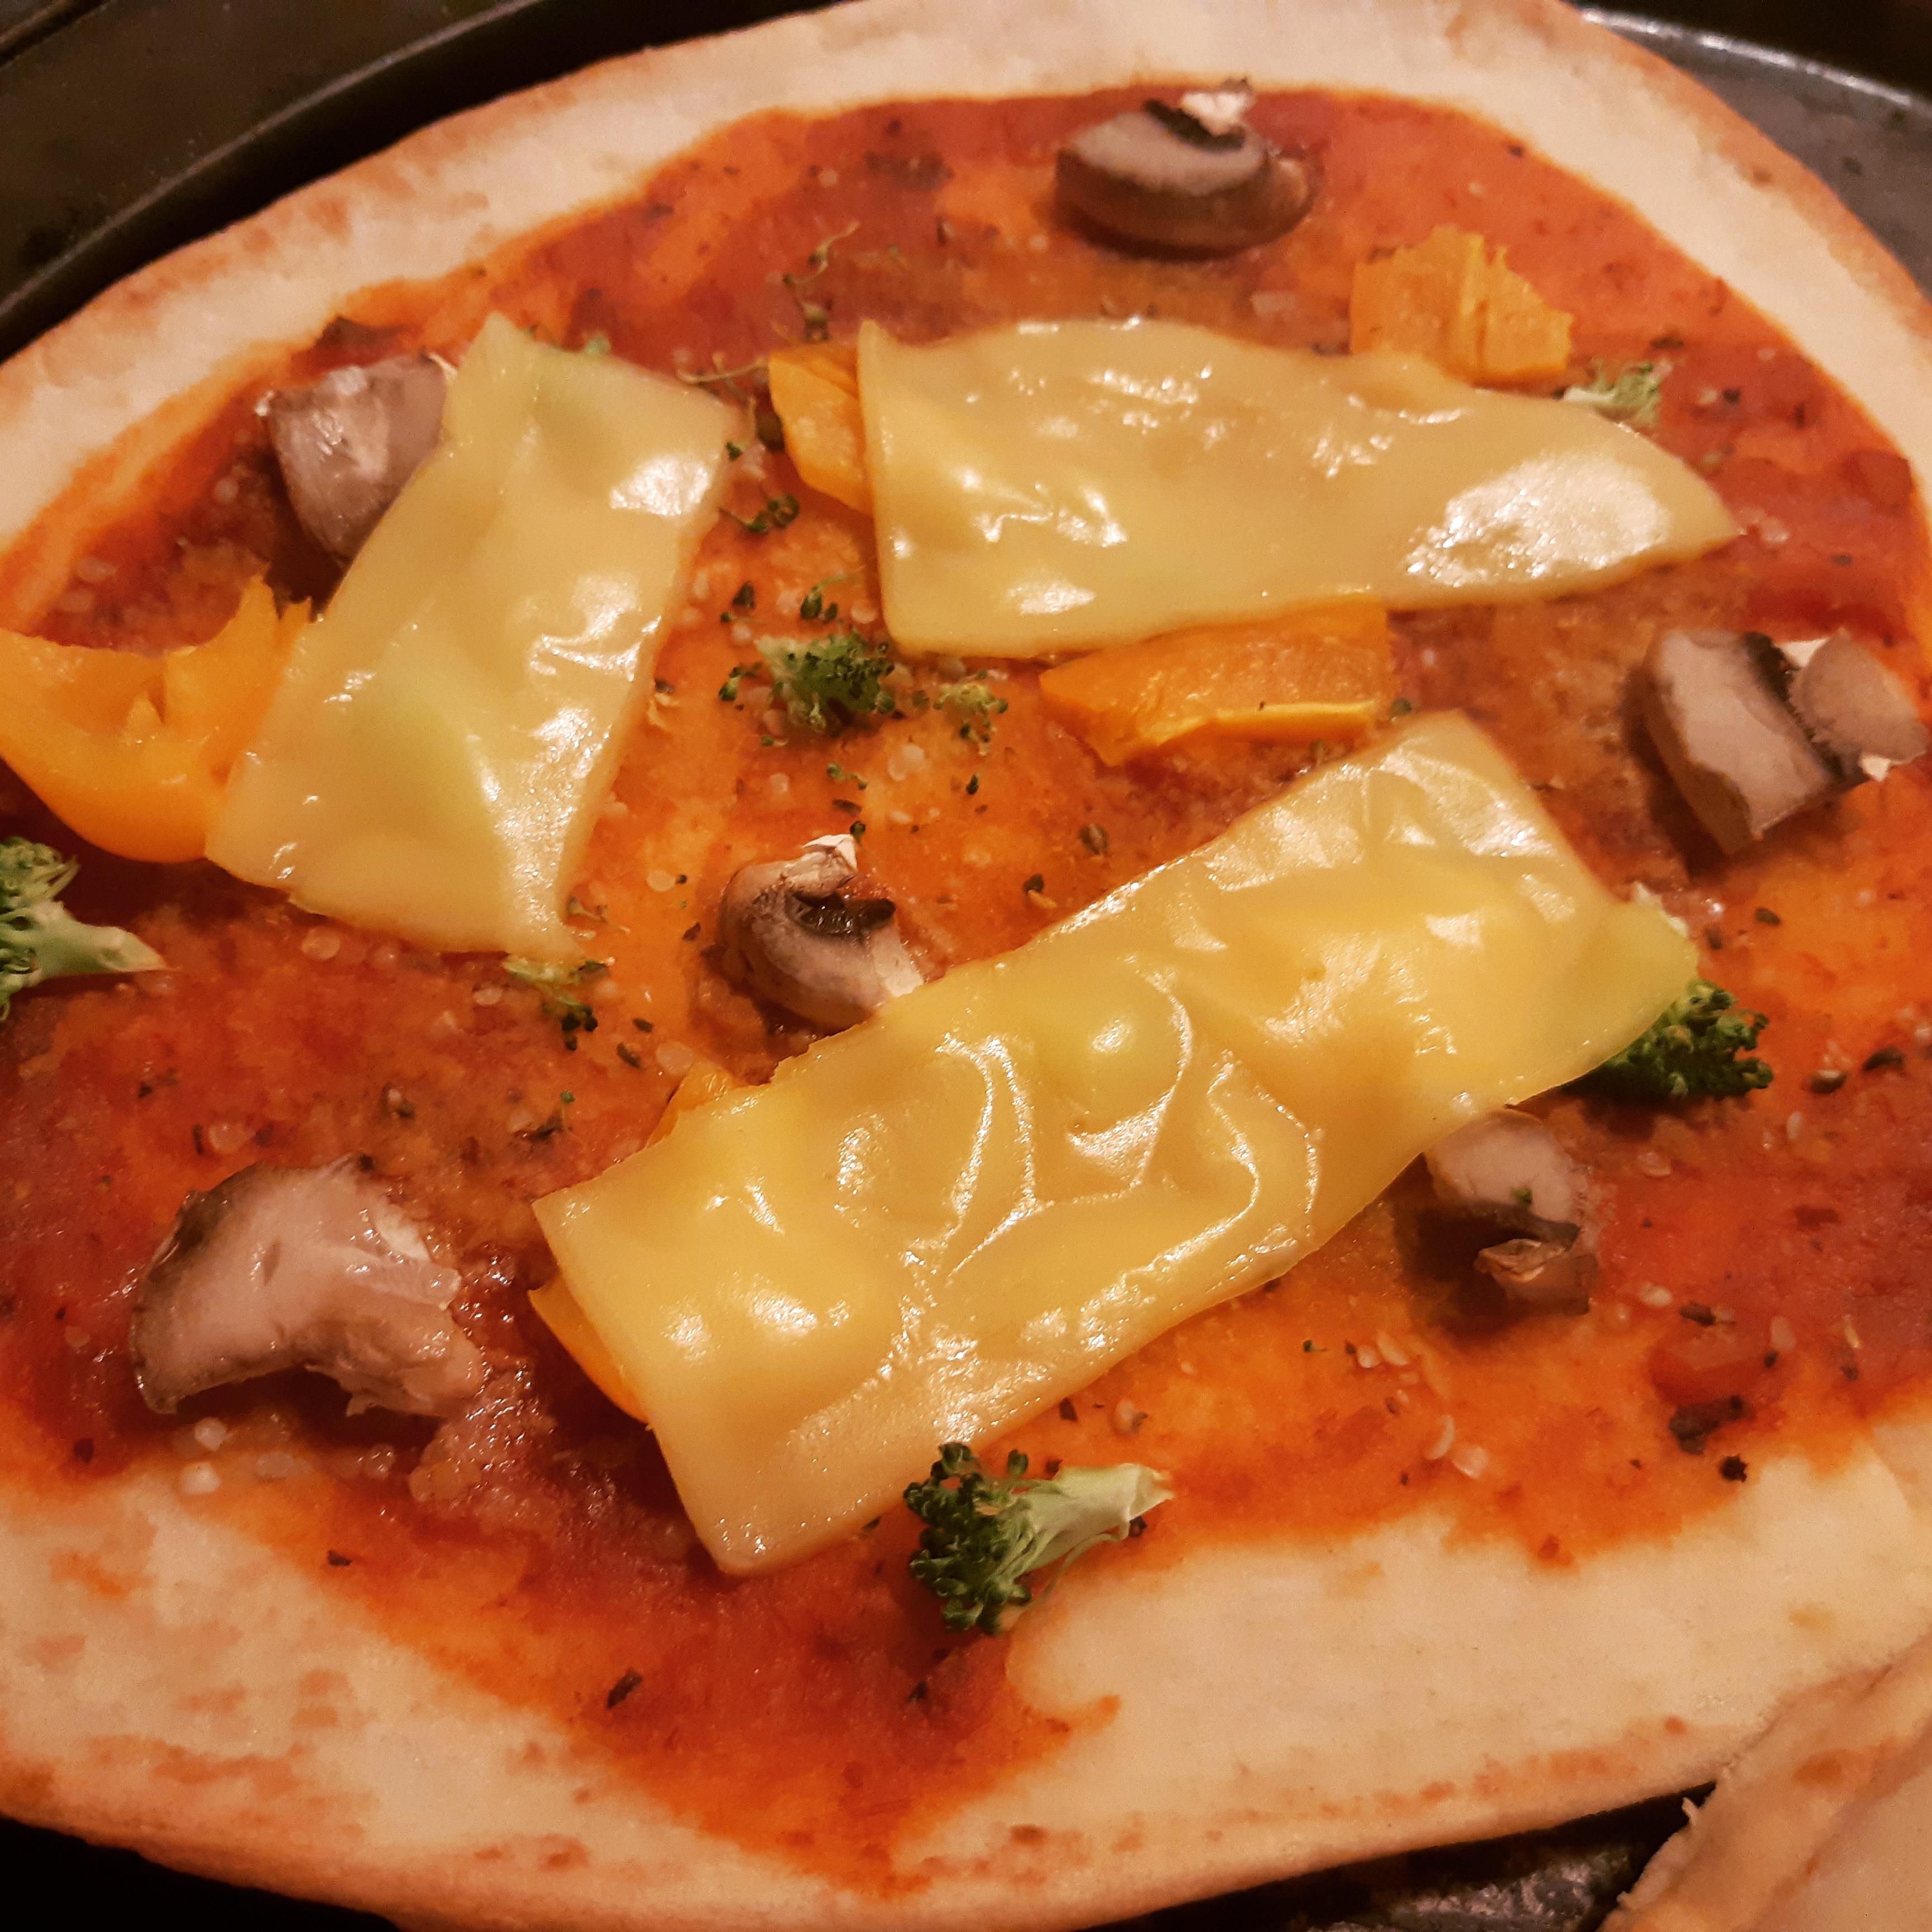 AterImber.com - The Veg Life - Product Reviews - Field Roasts' Chao Creamy Original Nann Pizza - vegan food, vegan food review, food reviewer, blogger